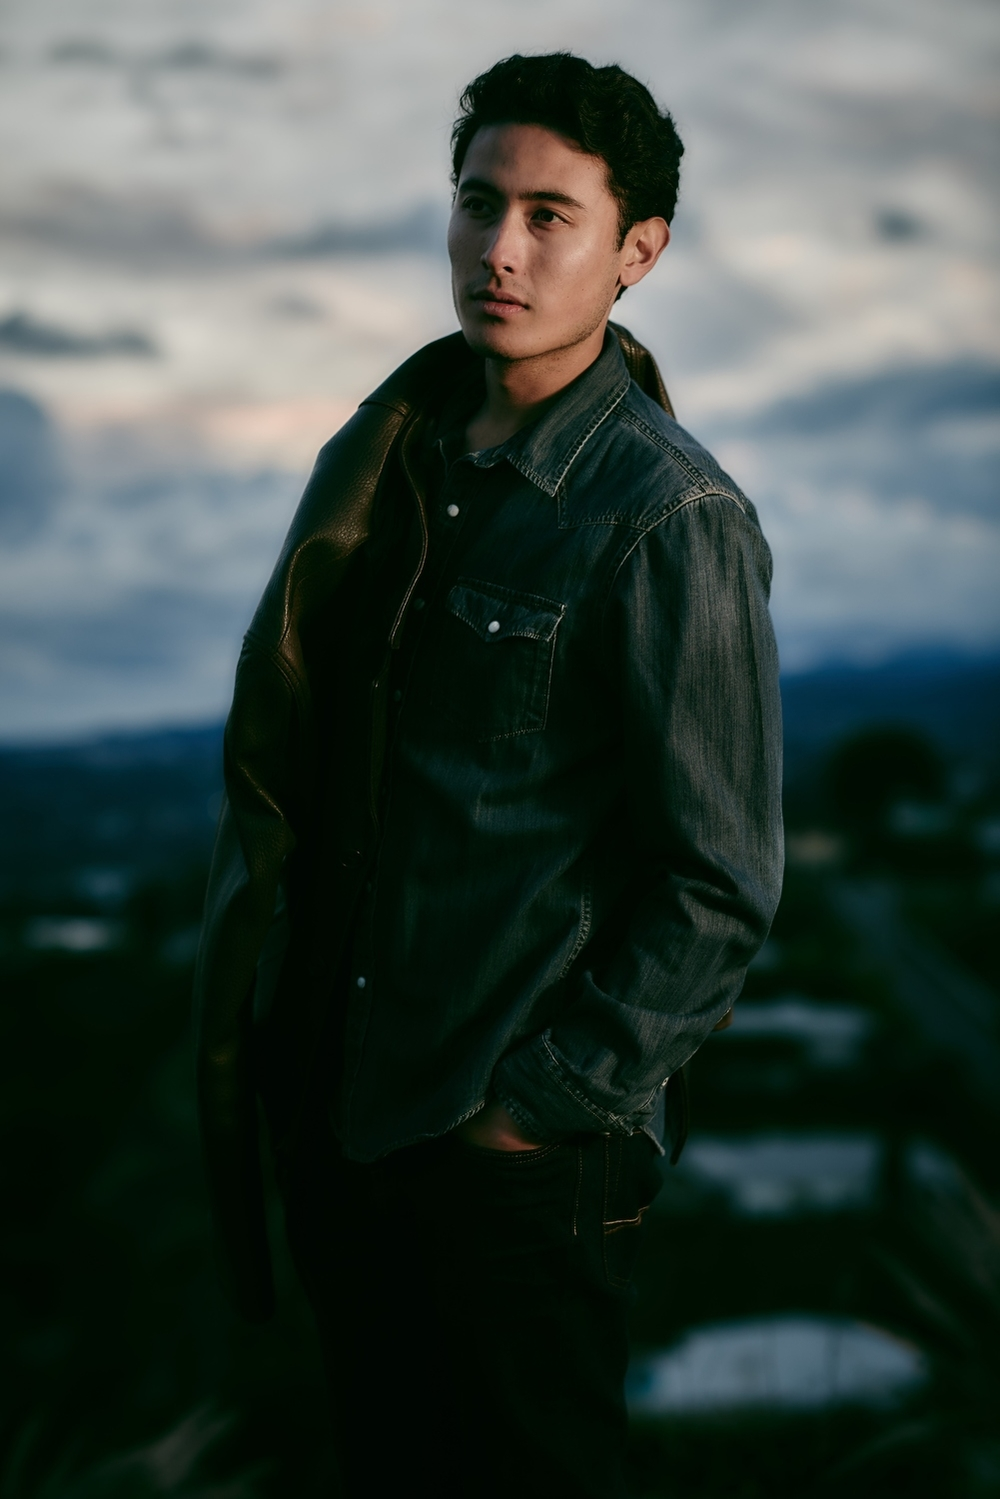 Model Brian Lee, CESD, Photo Credit: Michael Becker